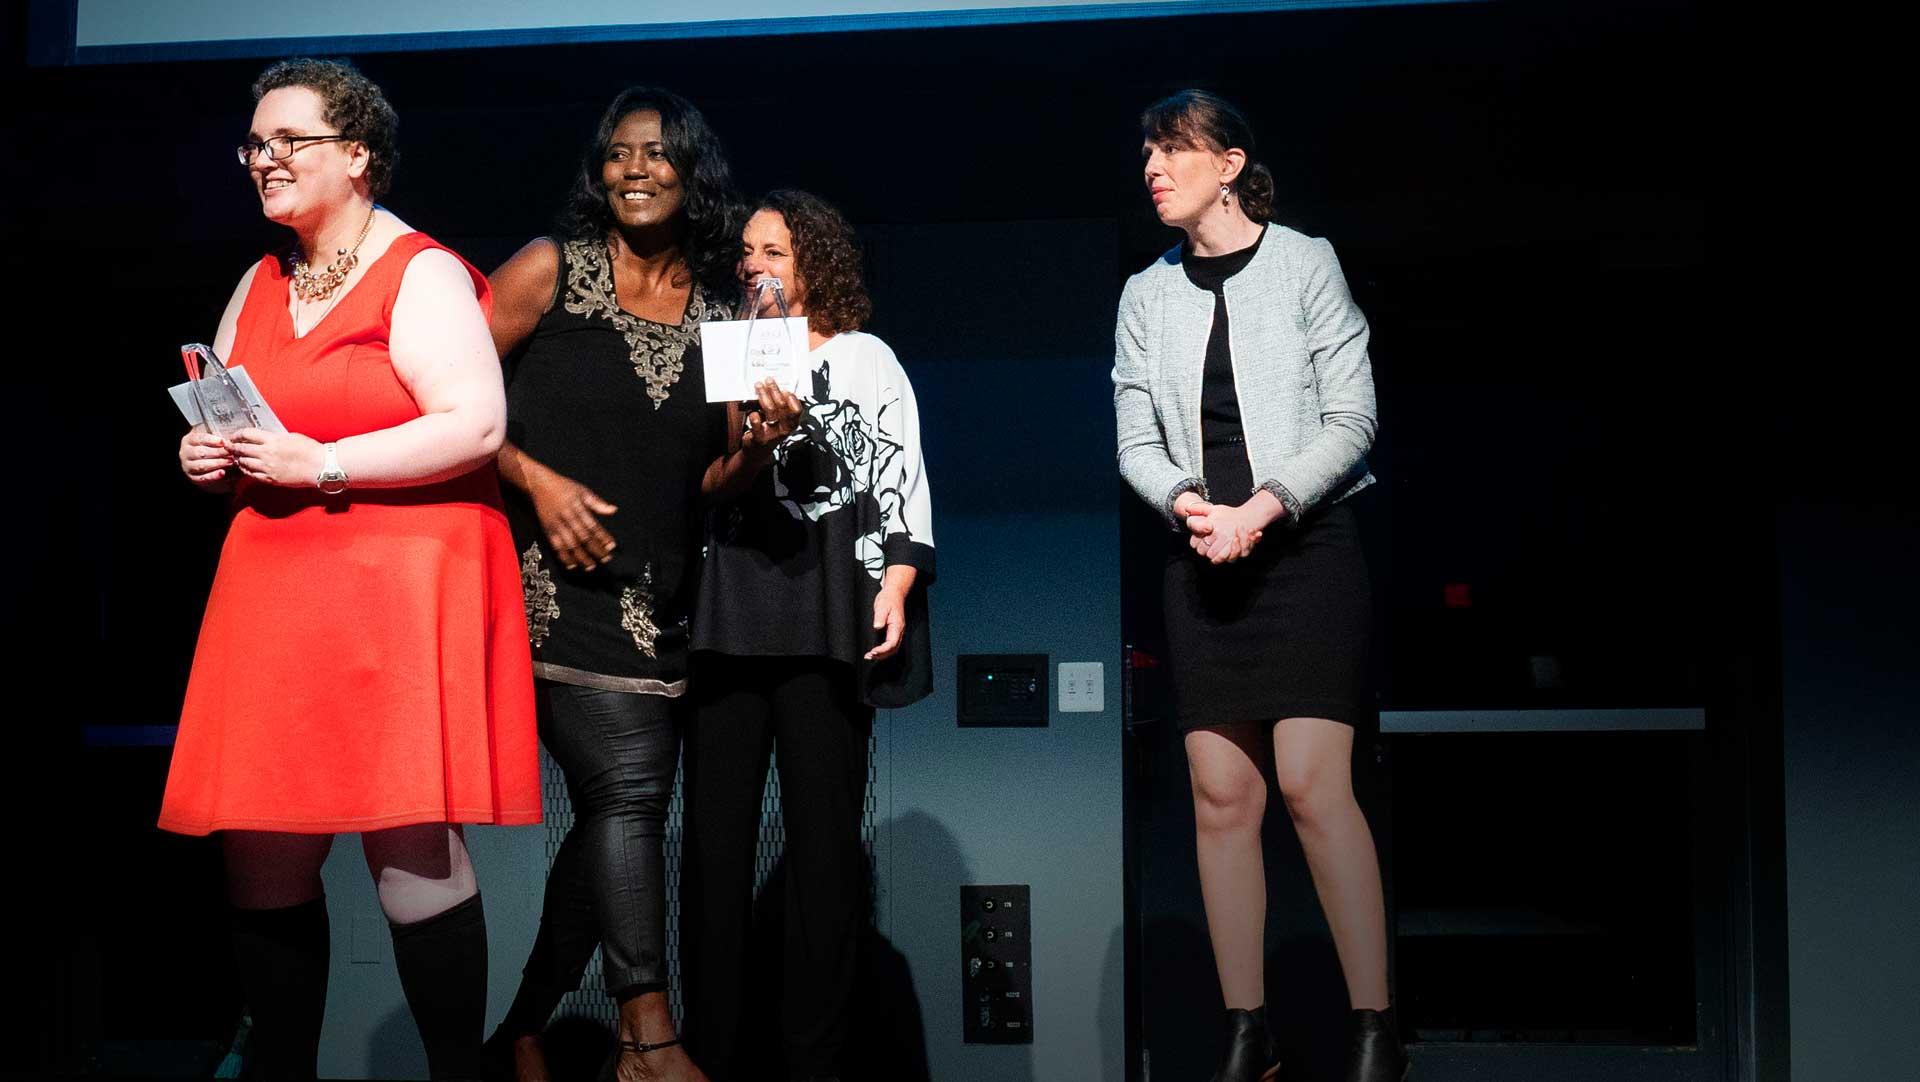 Individual holding award for inspiring change awards Cota event